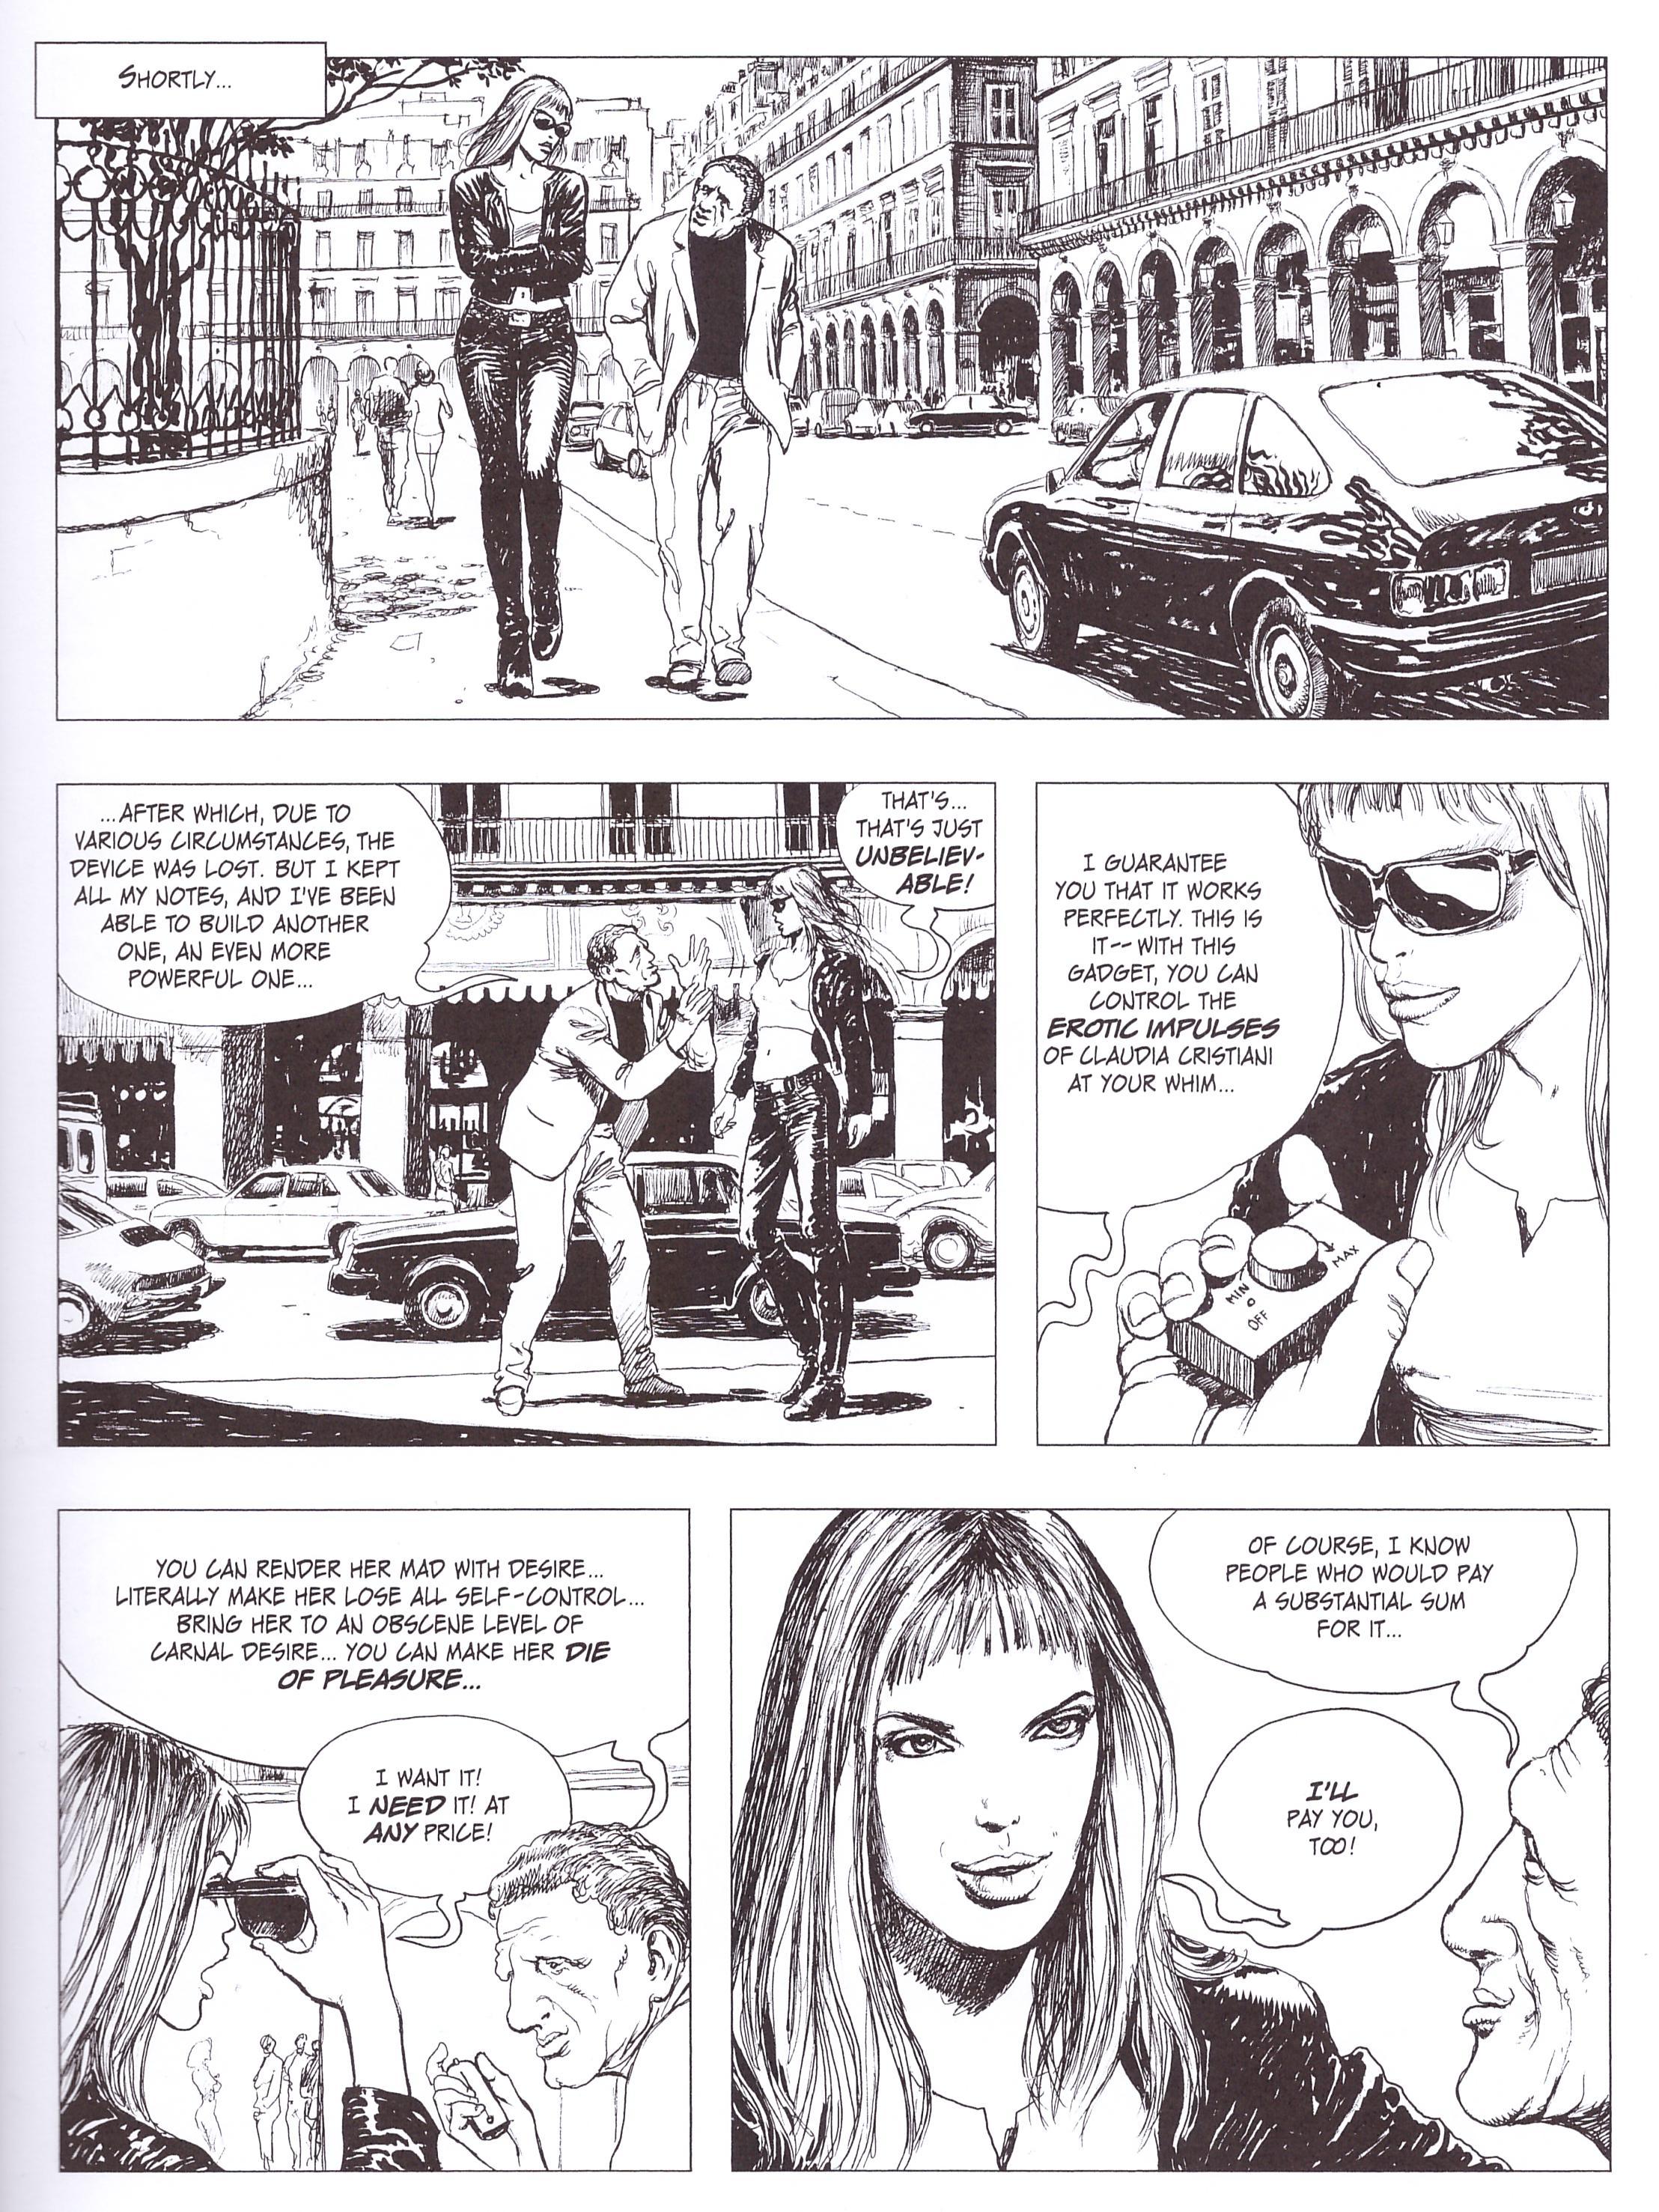 Manara Erotica Volume 1 graphic novel review